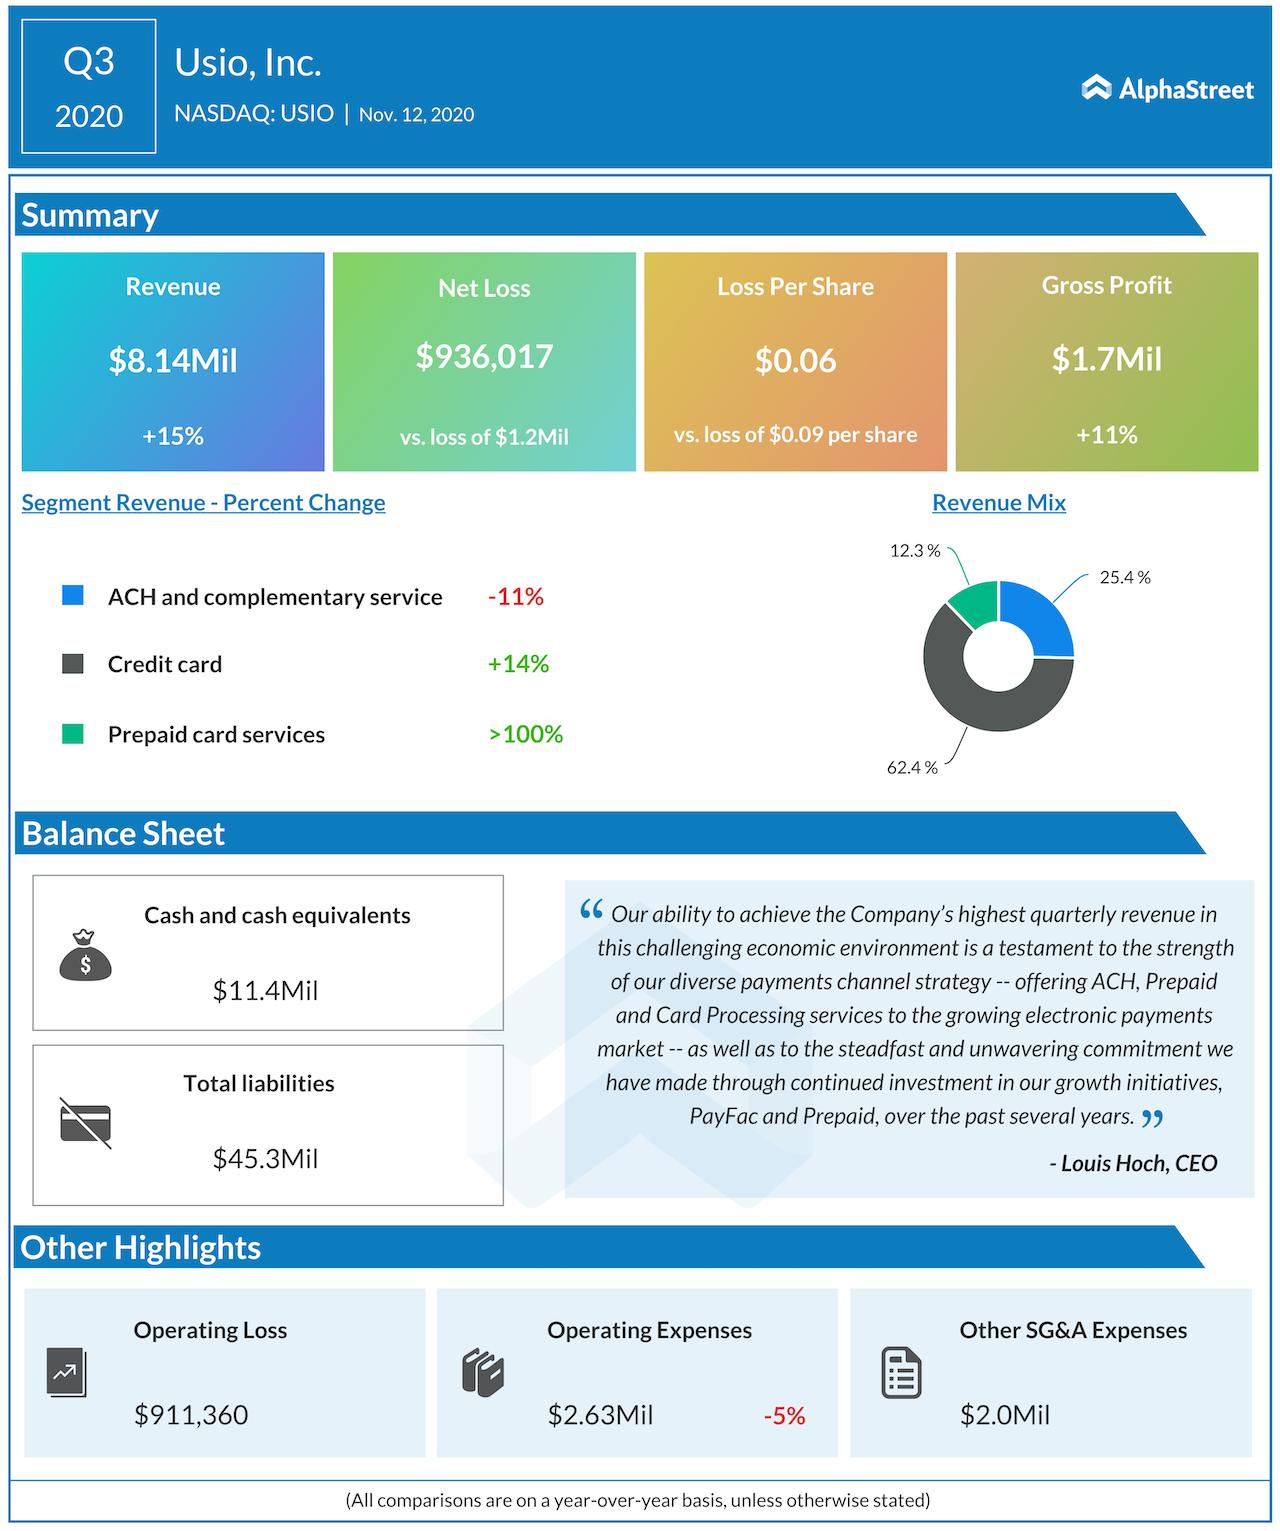 Usio Q3 2020 earnings infographic